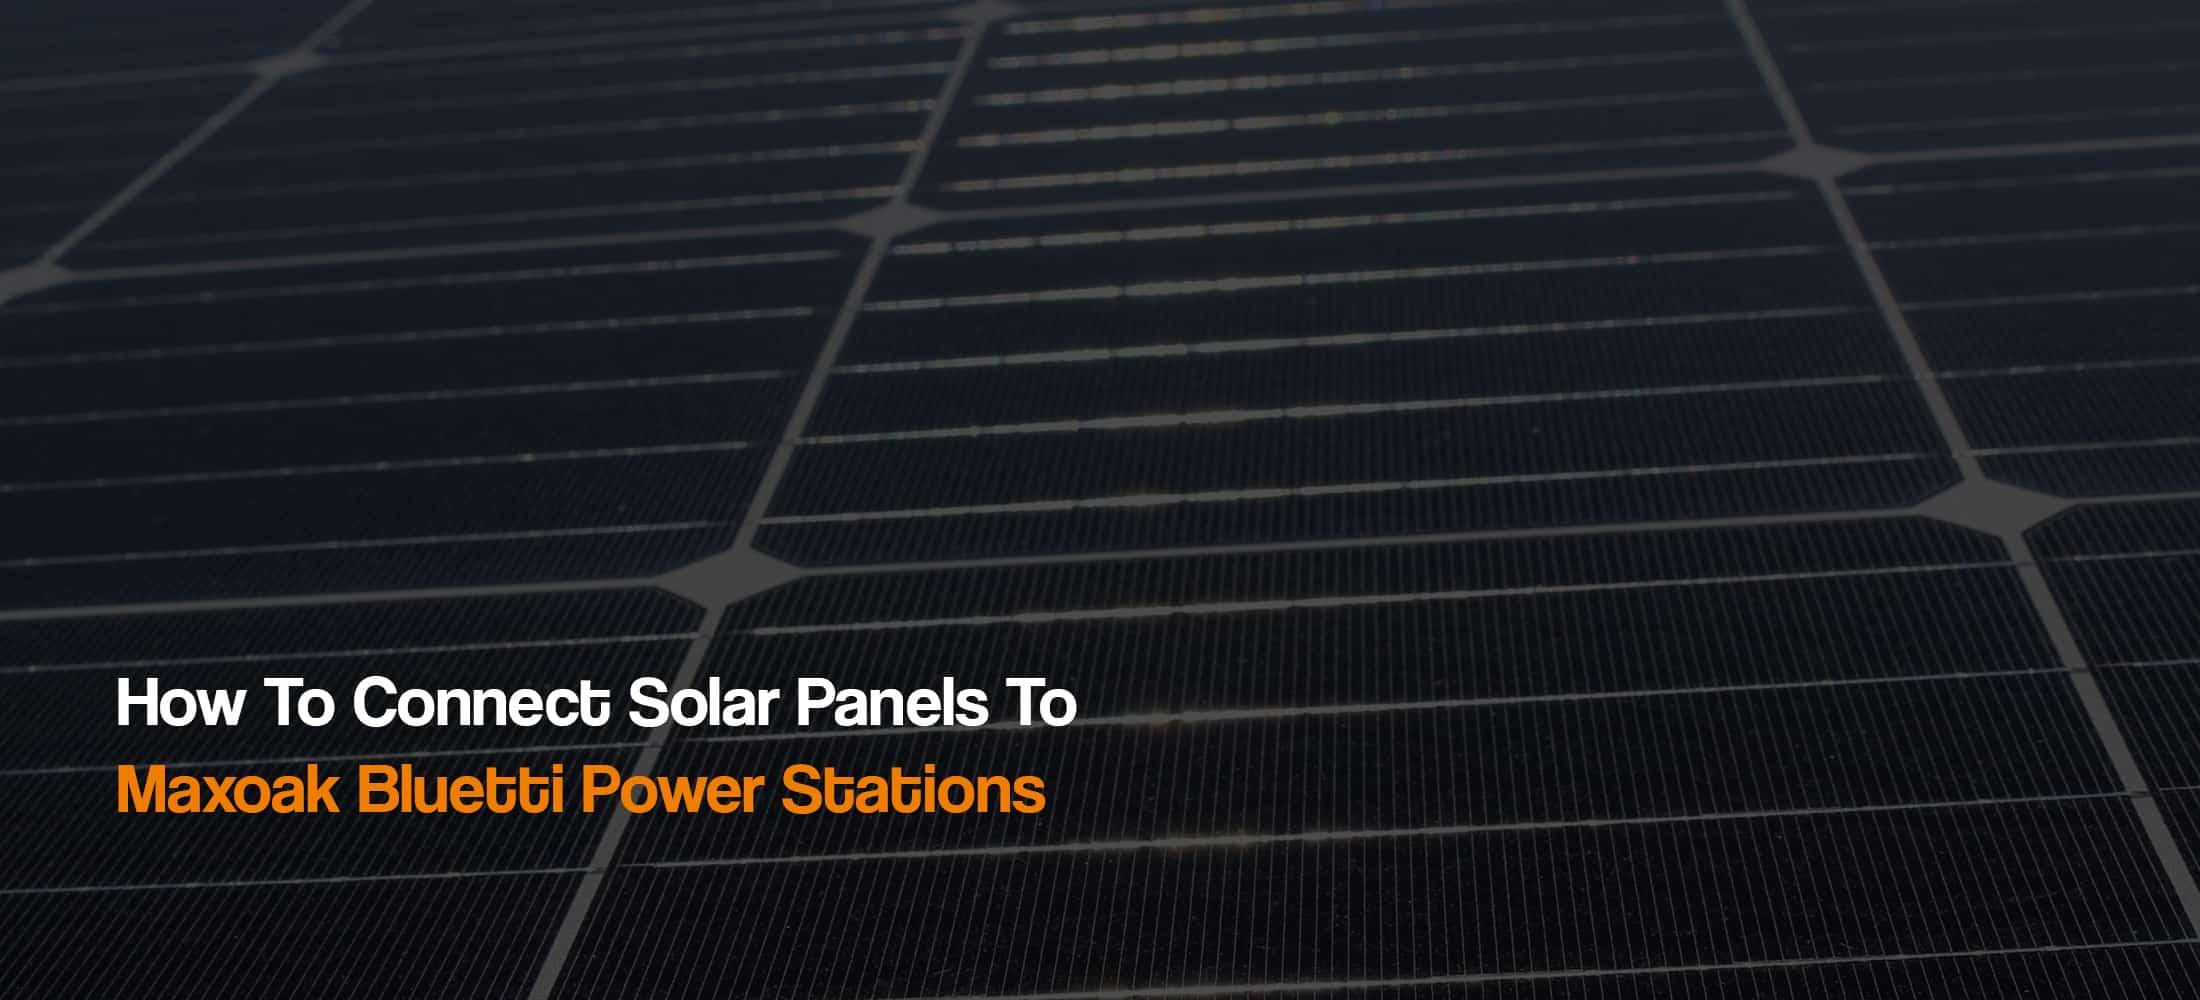 how-to-connect-compatible-solar-panels-to-maxoak-bluetti-power-stations-solar-generators-renogy-the-solar-addict